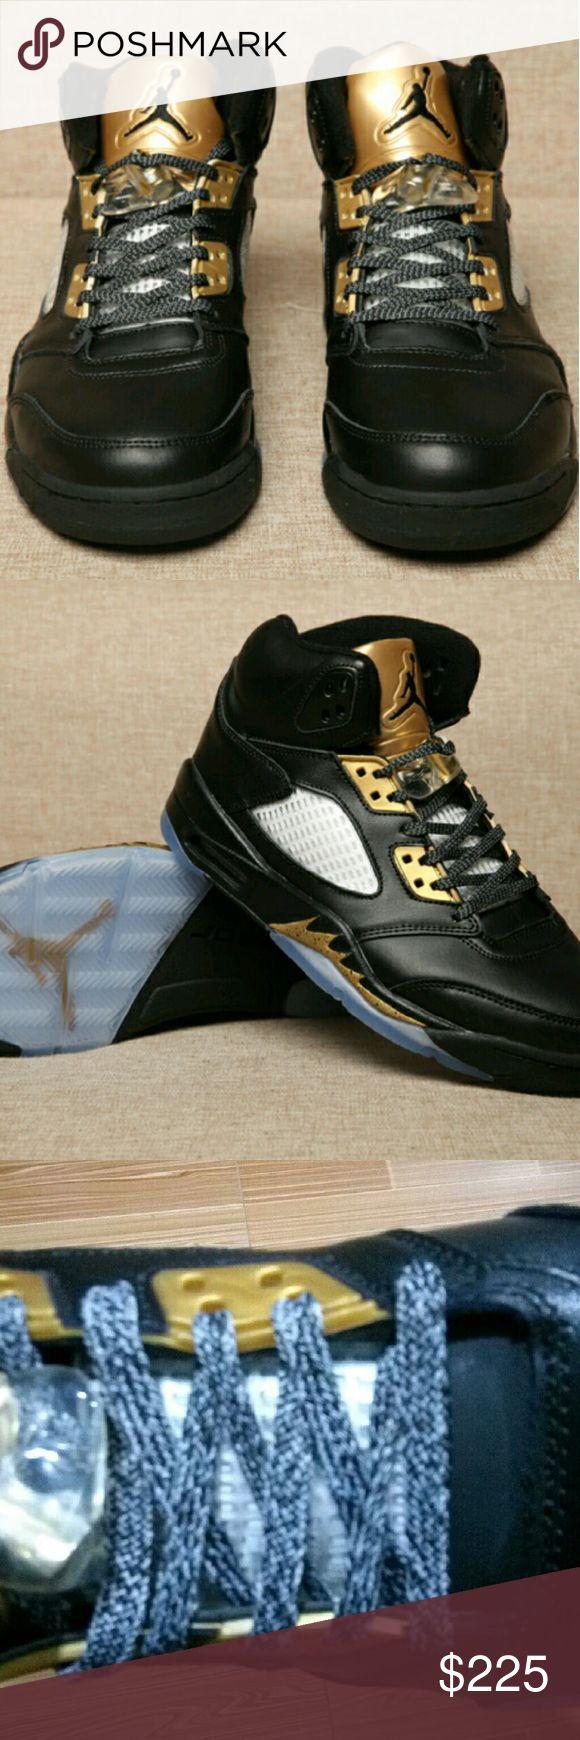 JORDAN RETRO 5 OLYMPIC BLACK / GOLD 10M NEW JORDAN RETRO 5 OLYMPIC CUSTOM SNEAKERS Nike Shoes Sneakers